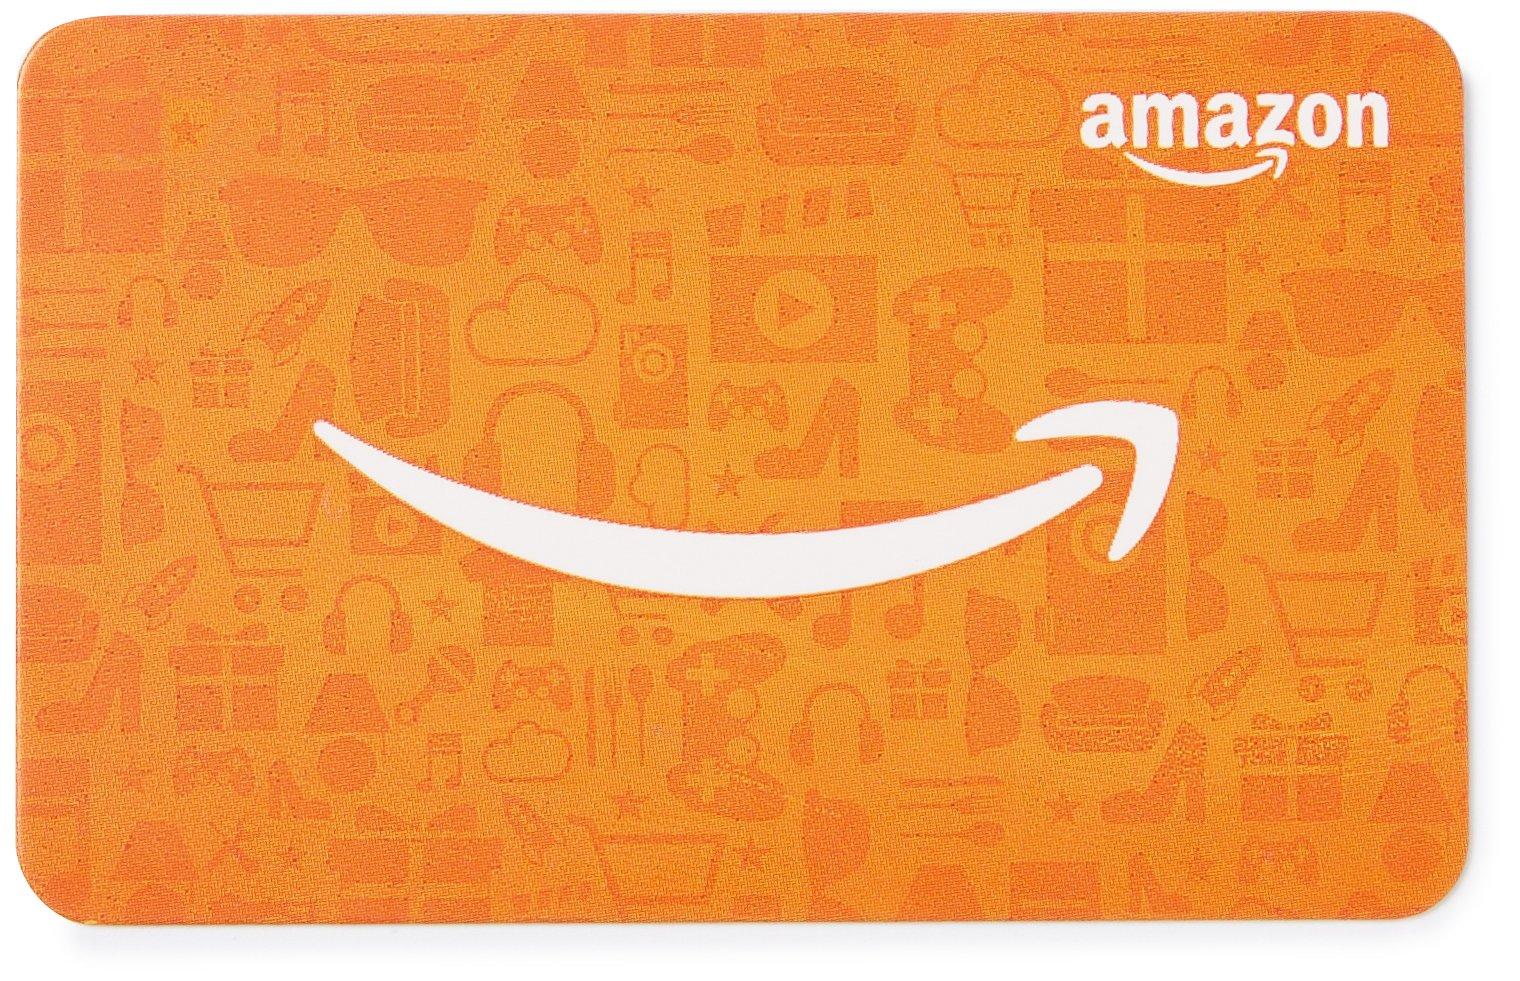 Buy Amazon Store Card Now!